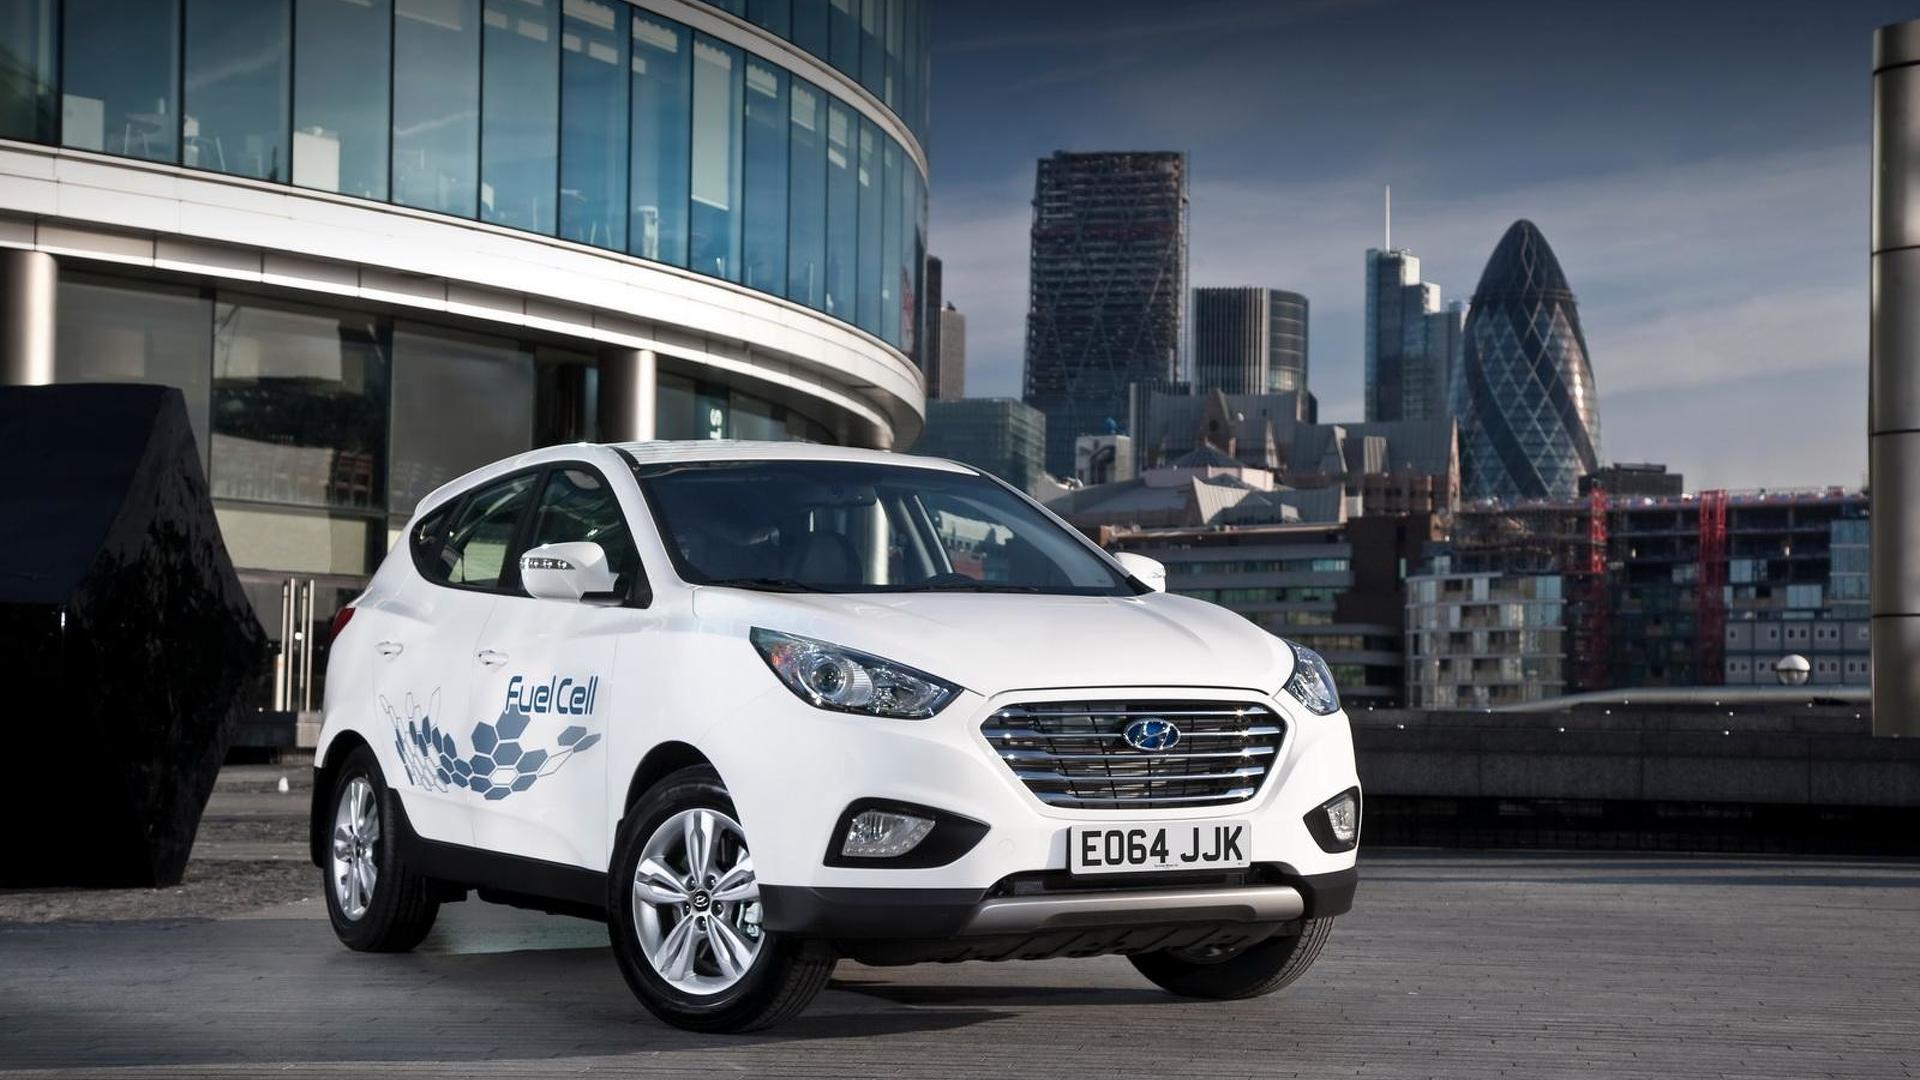 Hyundai Targets 2018 Winter Olympics To Debut Next Gen Hydrogen Fuel